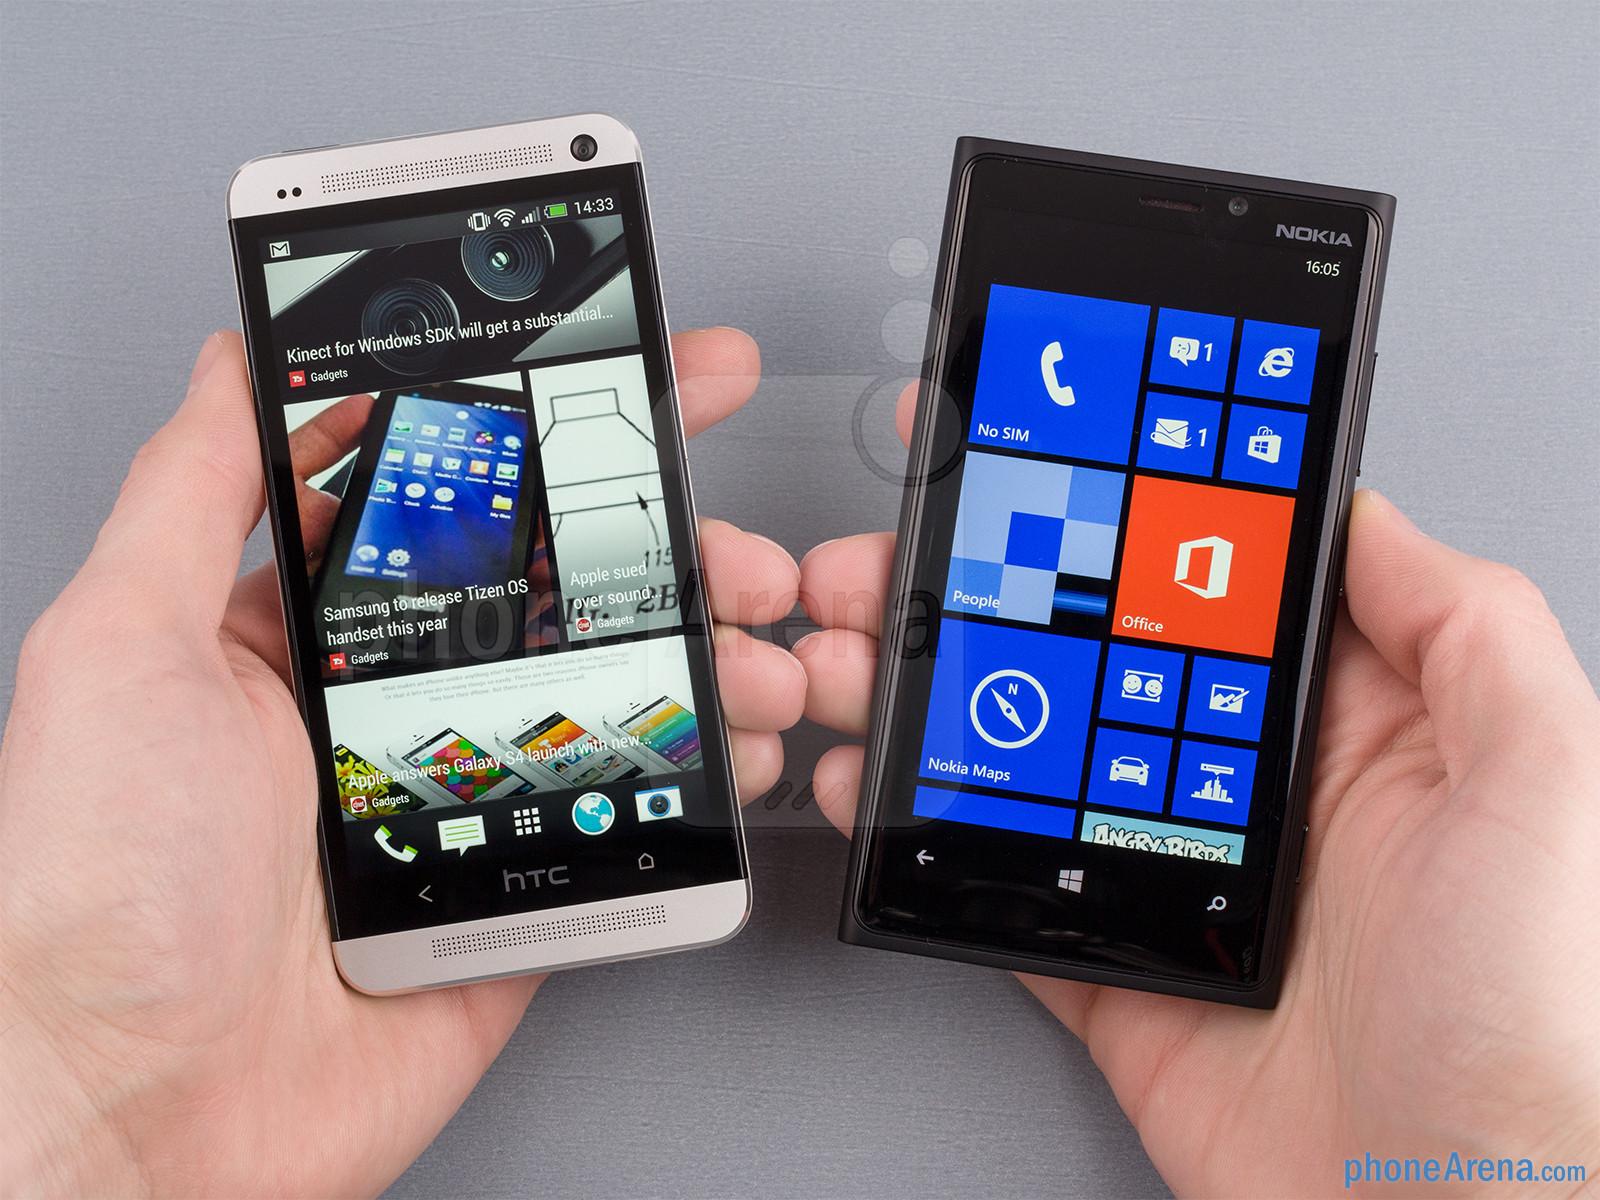 HTC-One-vs-Nokia-Lumia-920-03.jpg